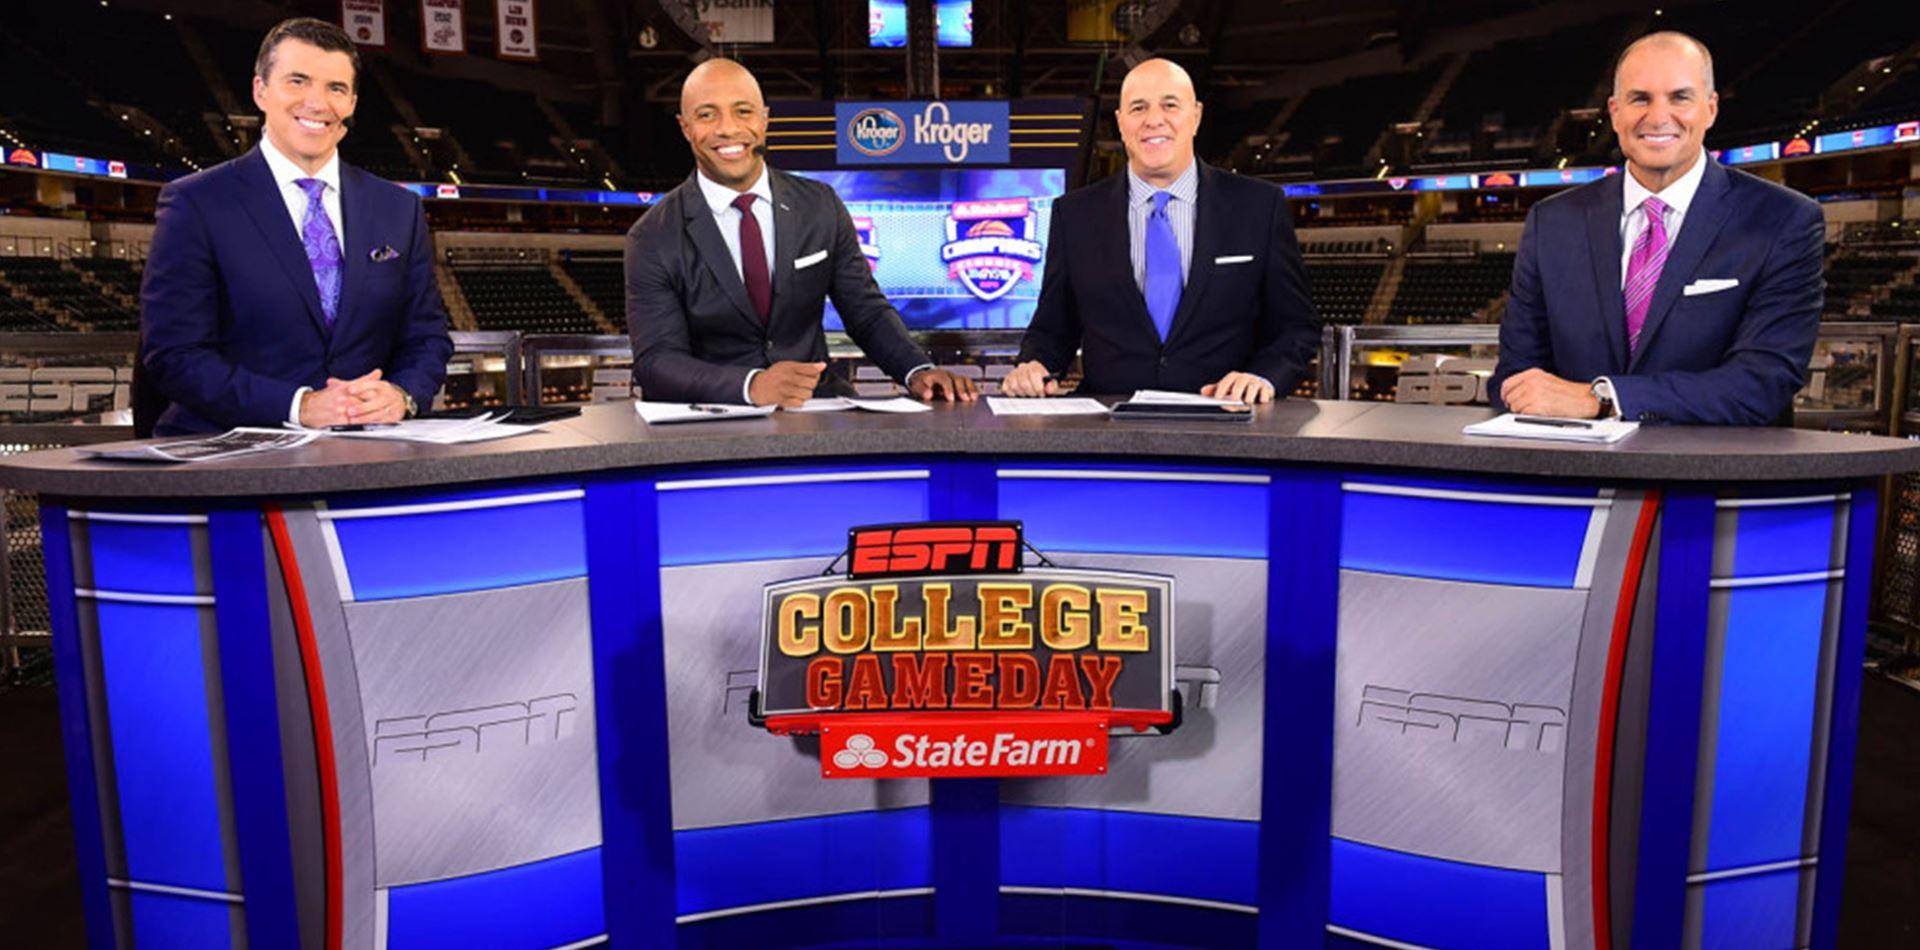 ESPN College GameDay Headed to Duke January 18